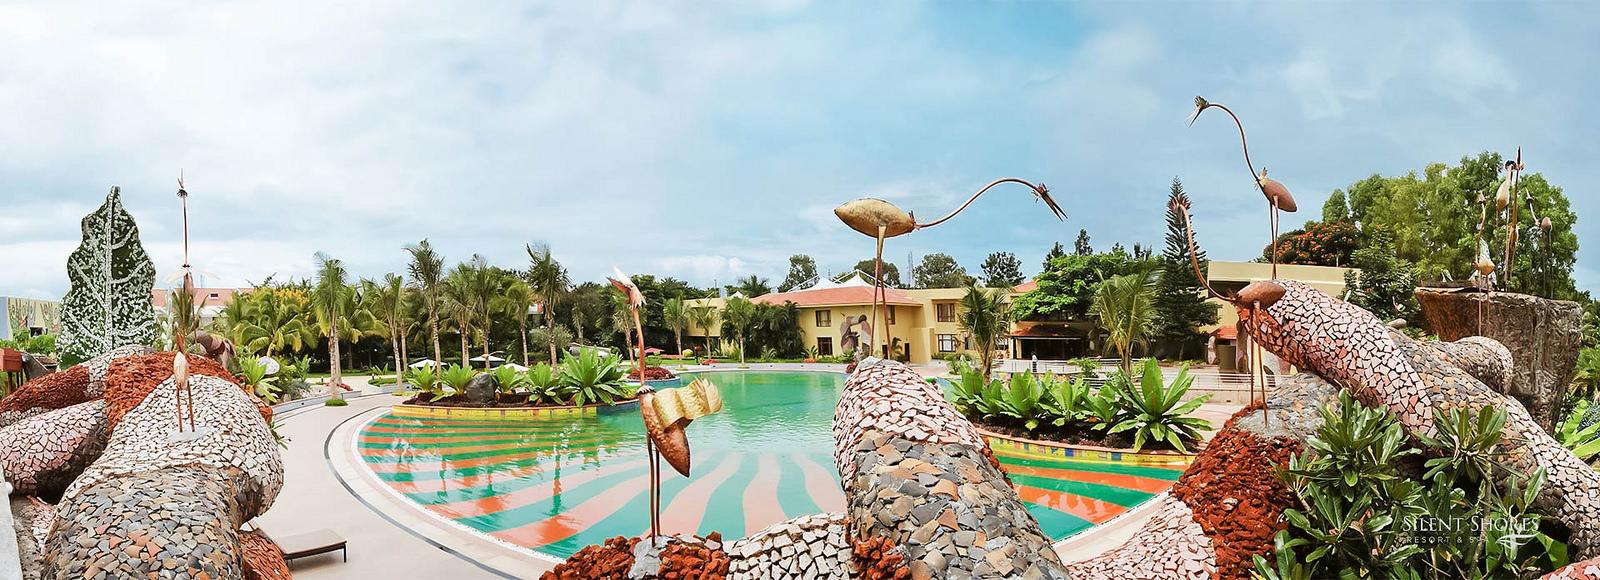 silent-shores-ayurveda-resort-and-spa-mysore-karnataka-6